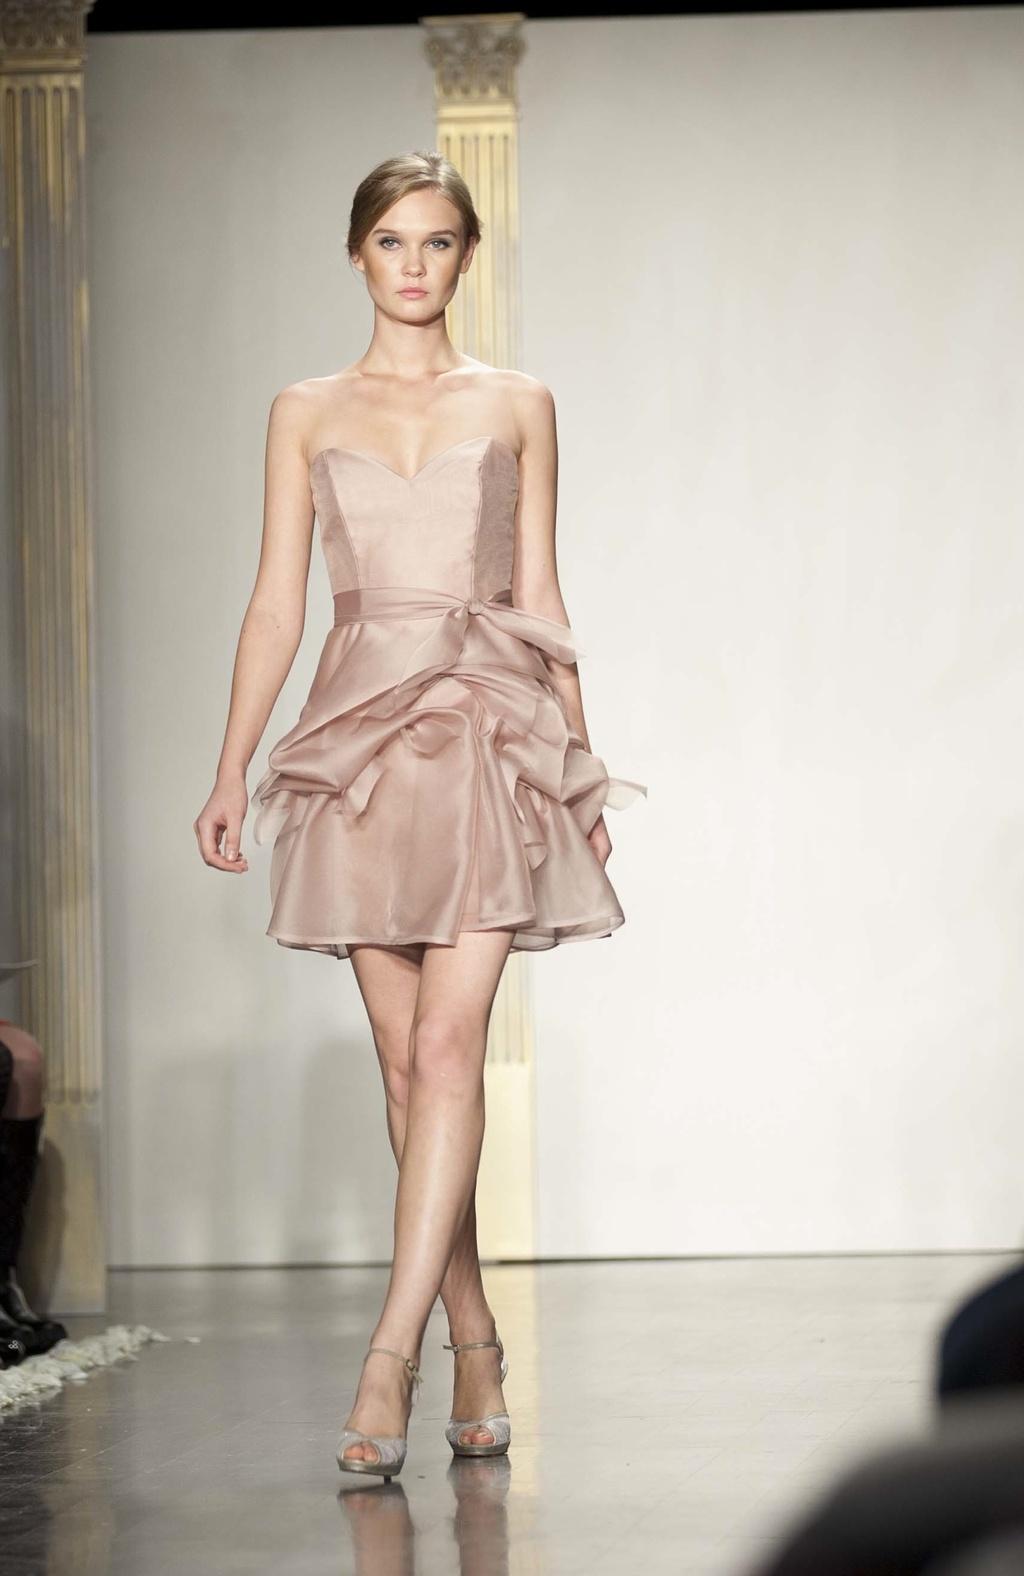 Bridesmaids-dresses-fall-2012-lazaro-blush-nude-mini.full